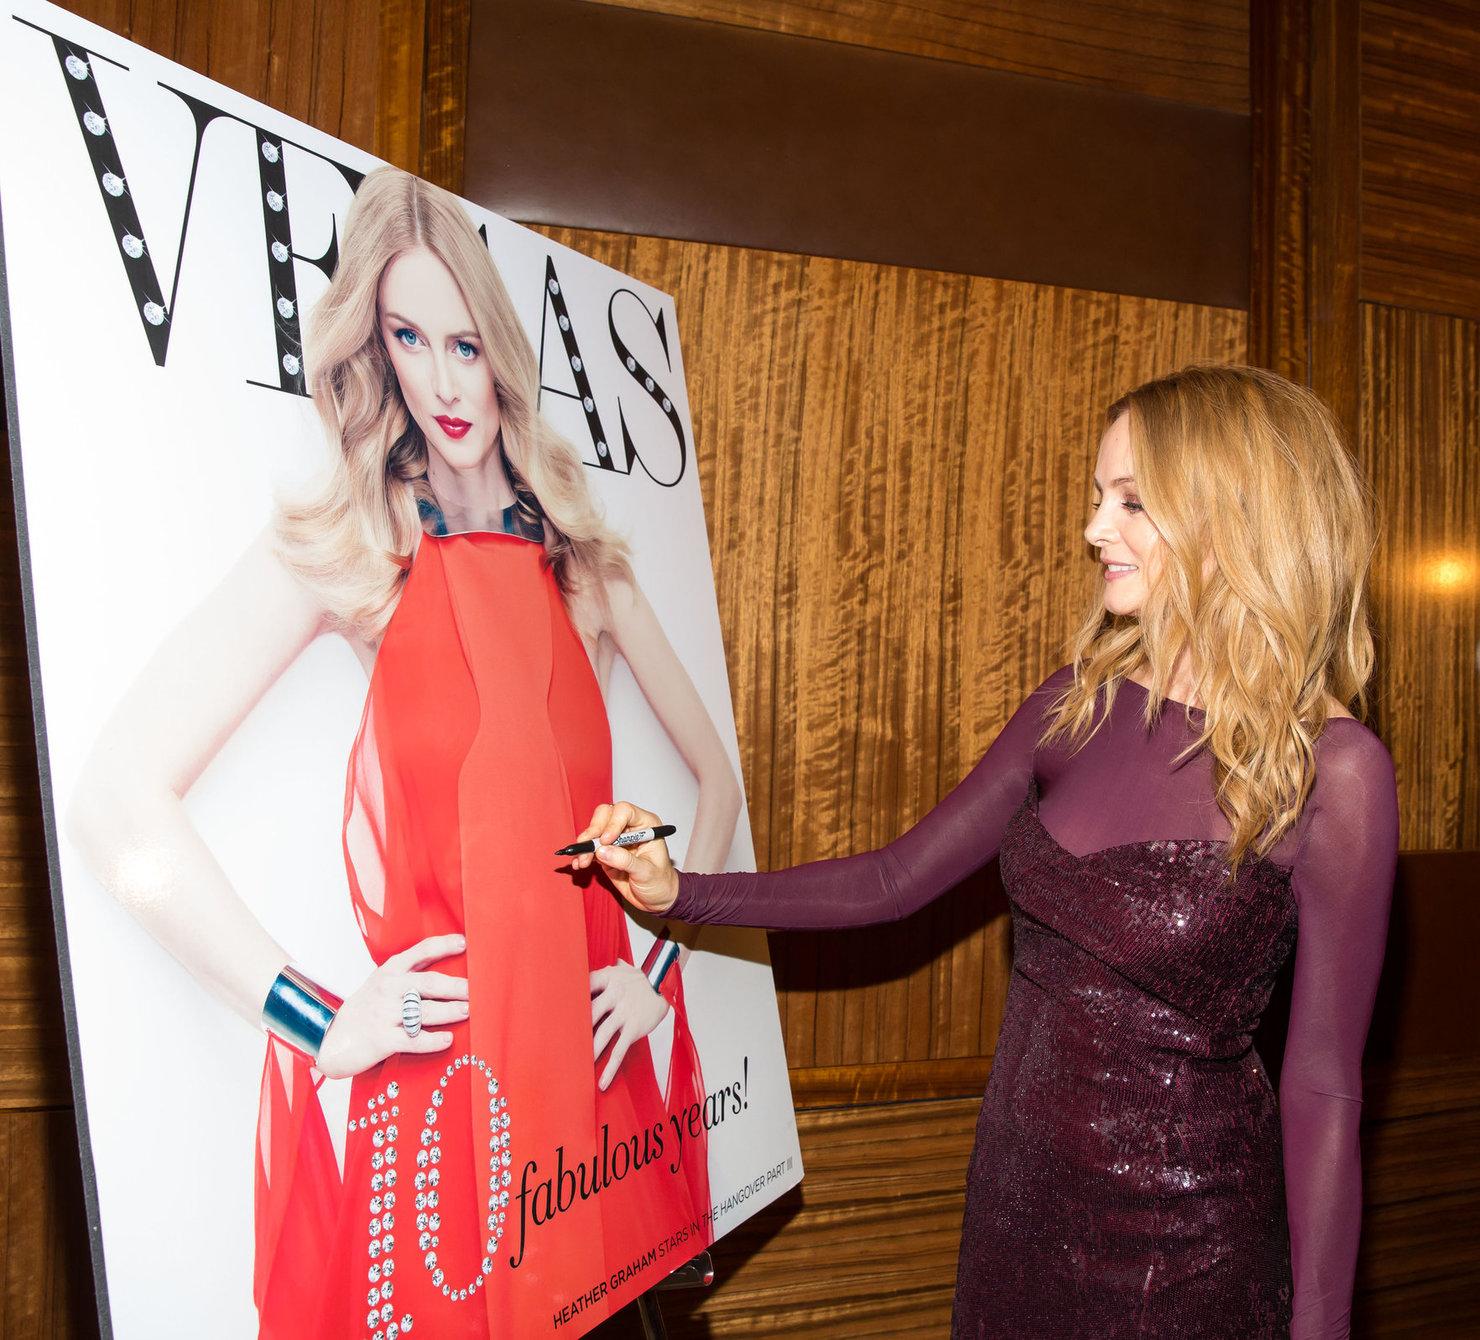 Heather Graham attends the Vegas Magazine's 10th anniversary celebration at Mandarin Oriental in Las Vegas - May 9, 2013